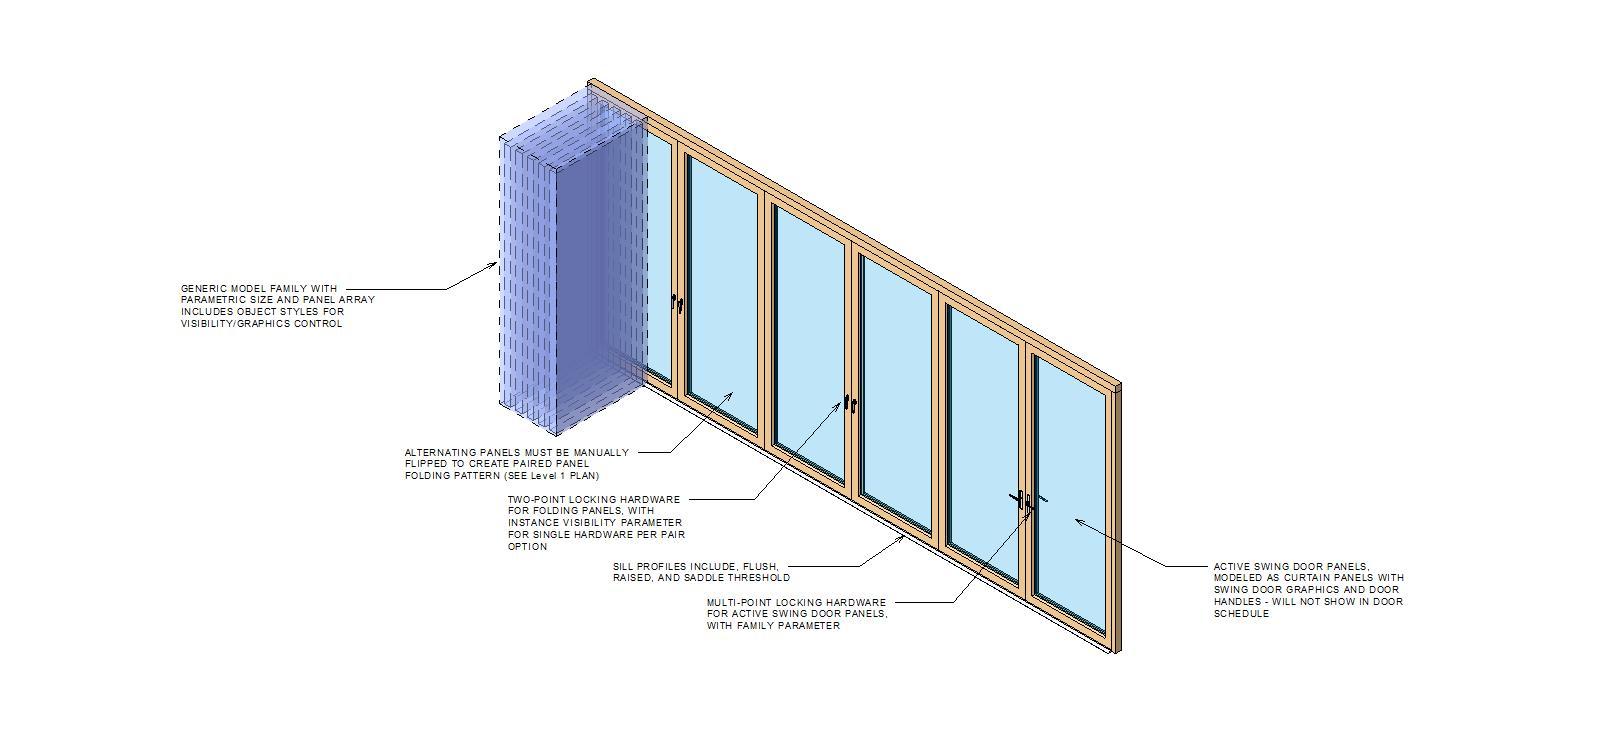 Stunning nanawall folding door gallery plan 3d house for Nanawall plan